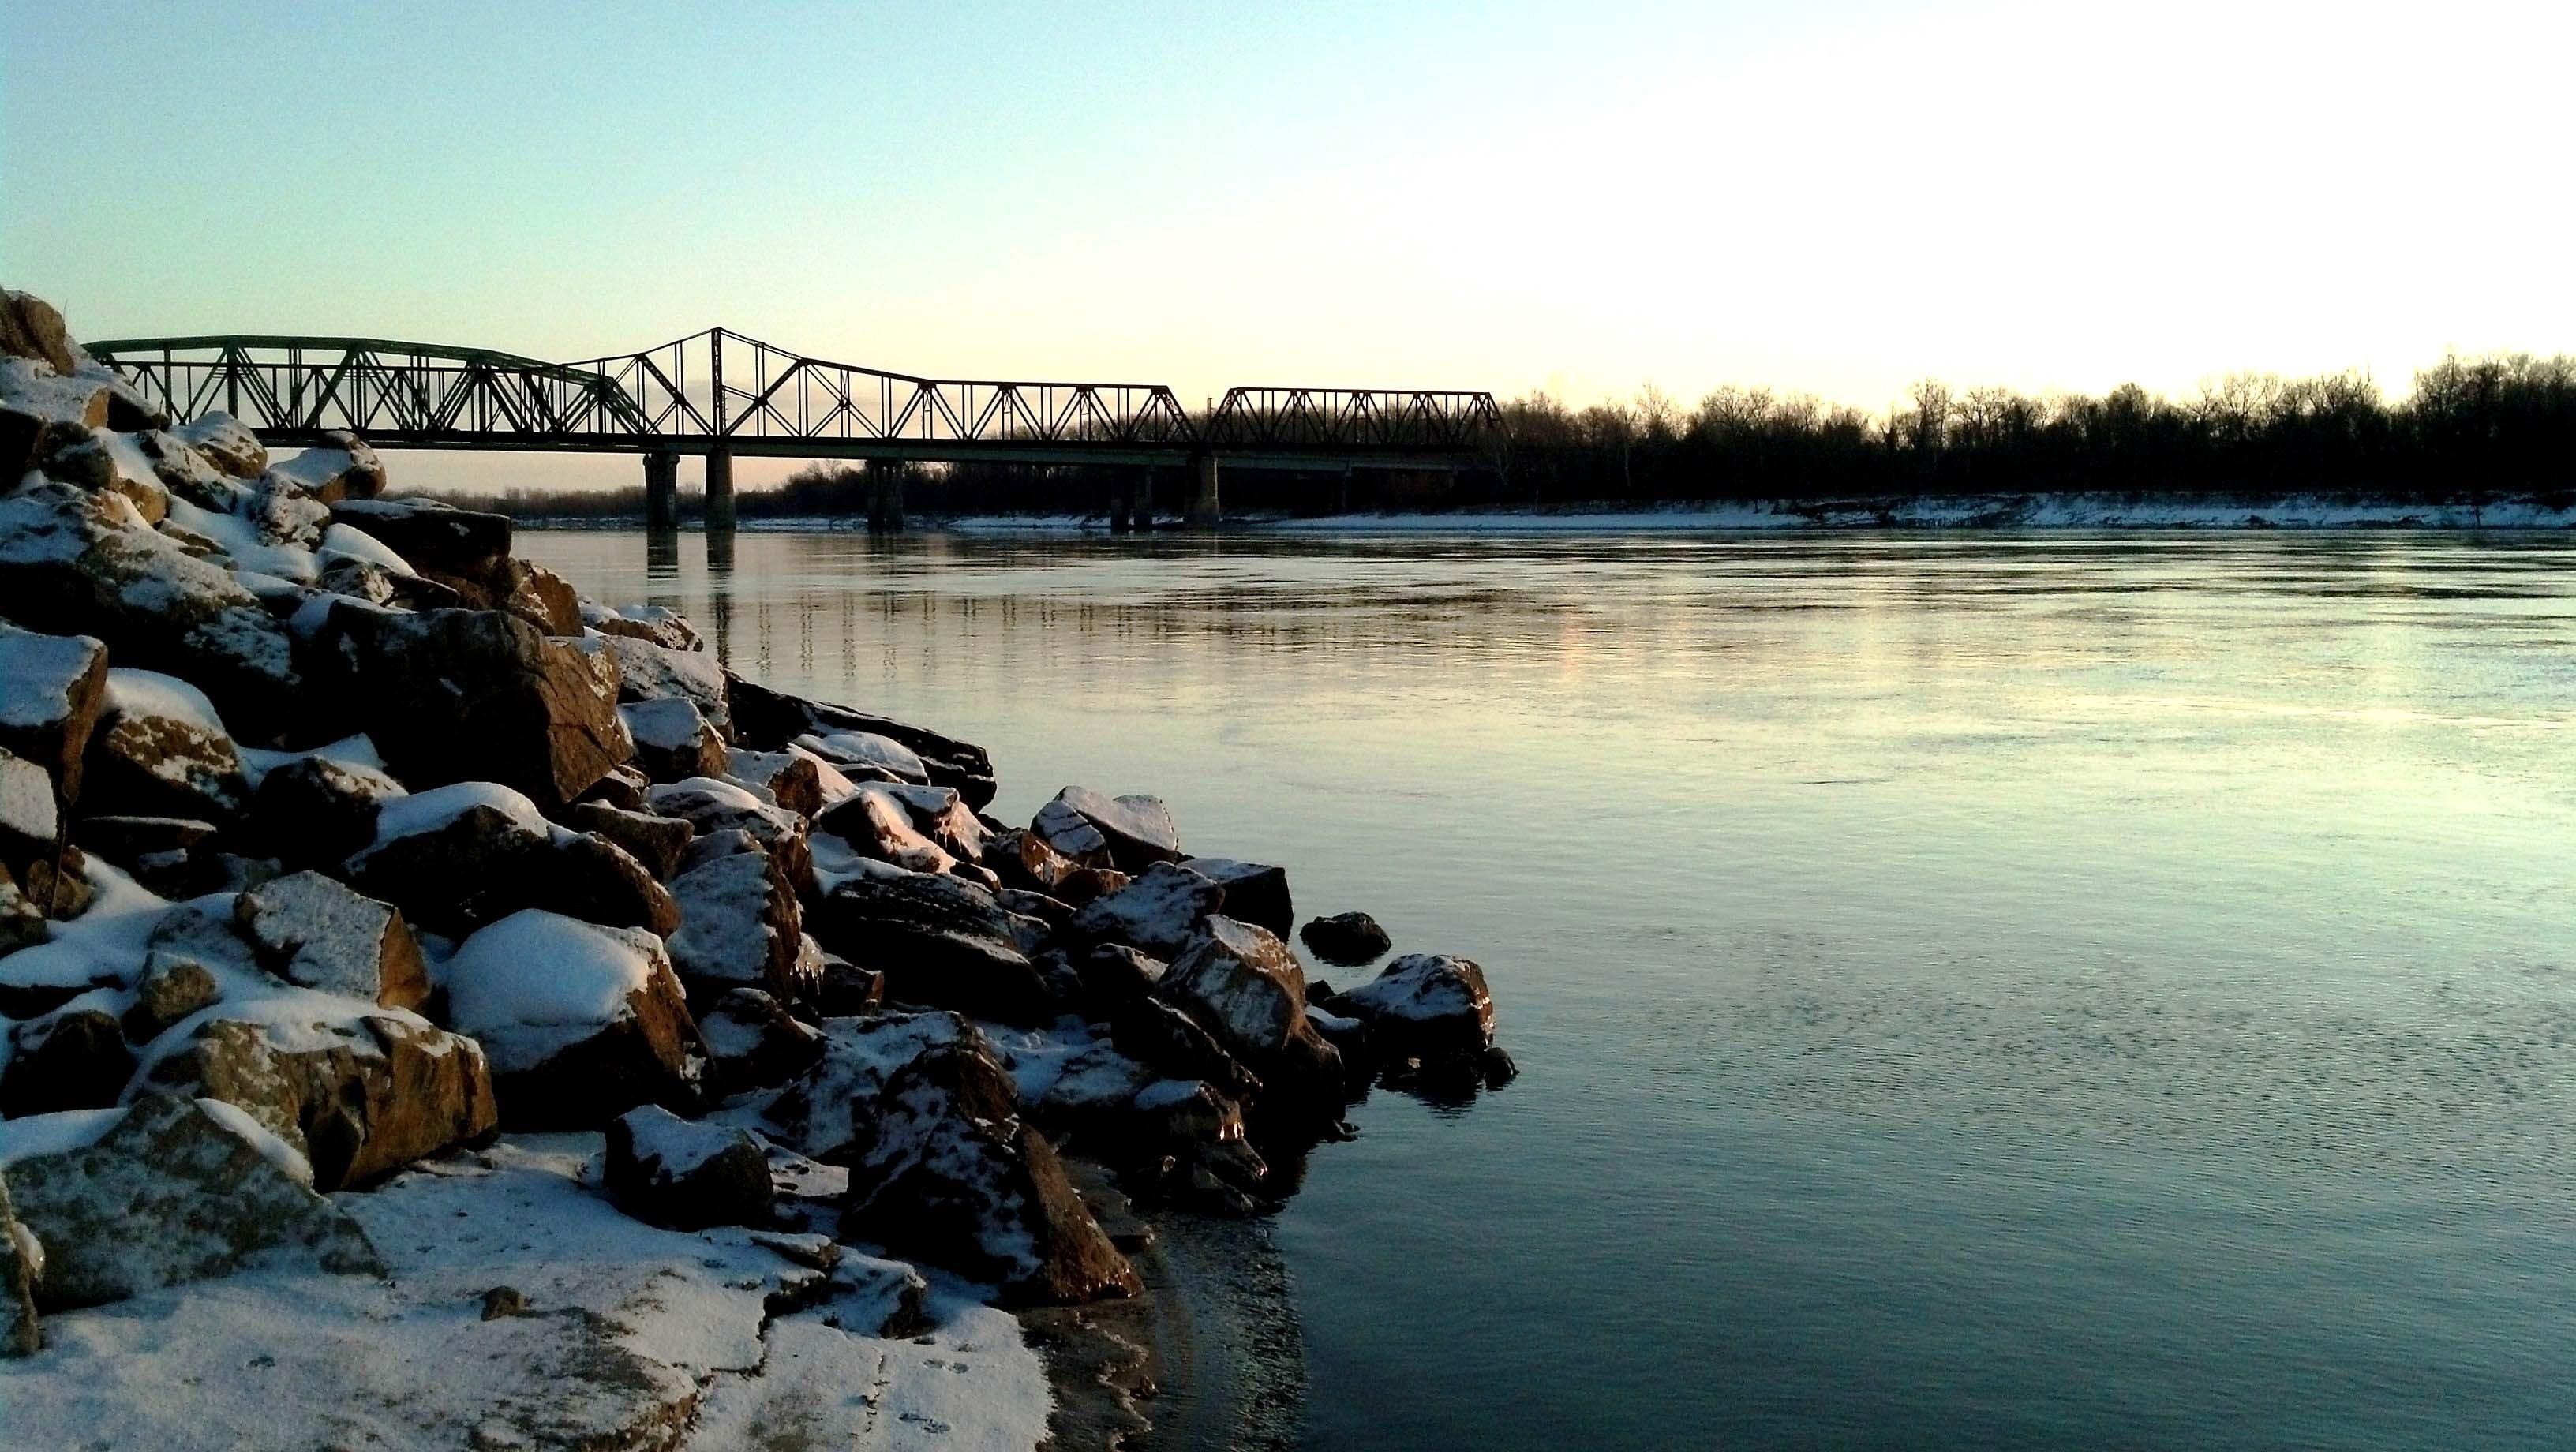 St. Charles County, Missouri, United States of America